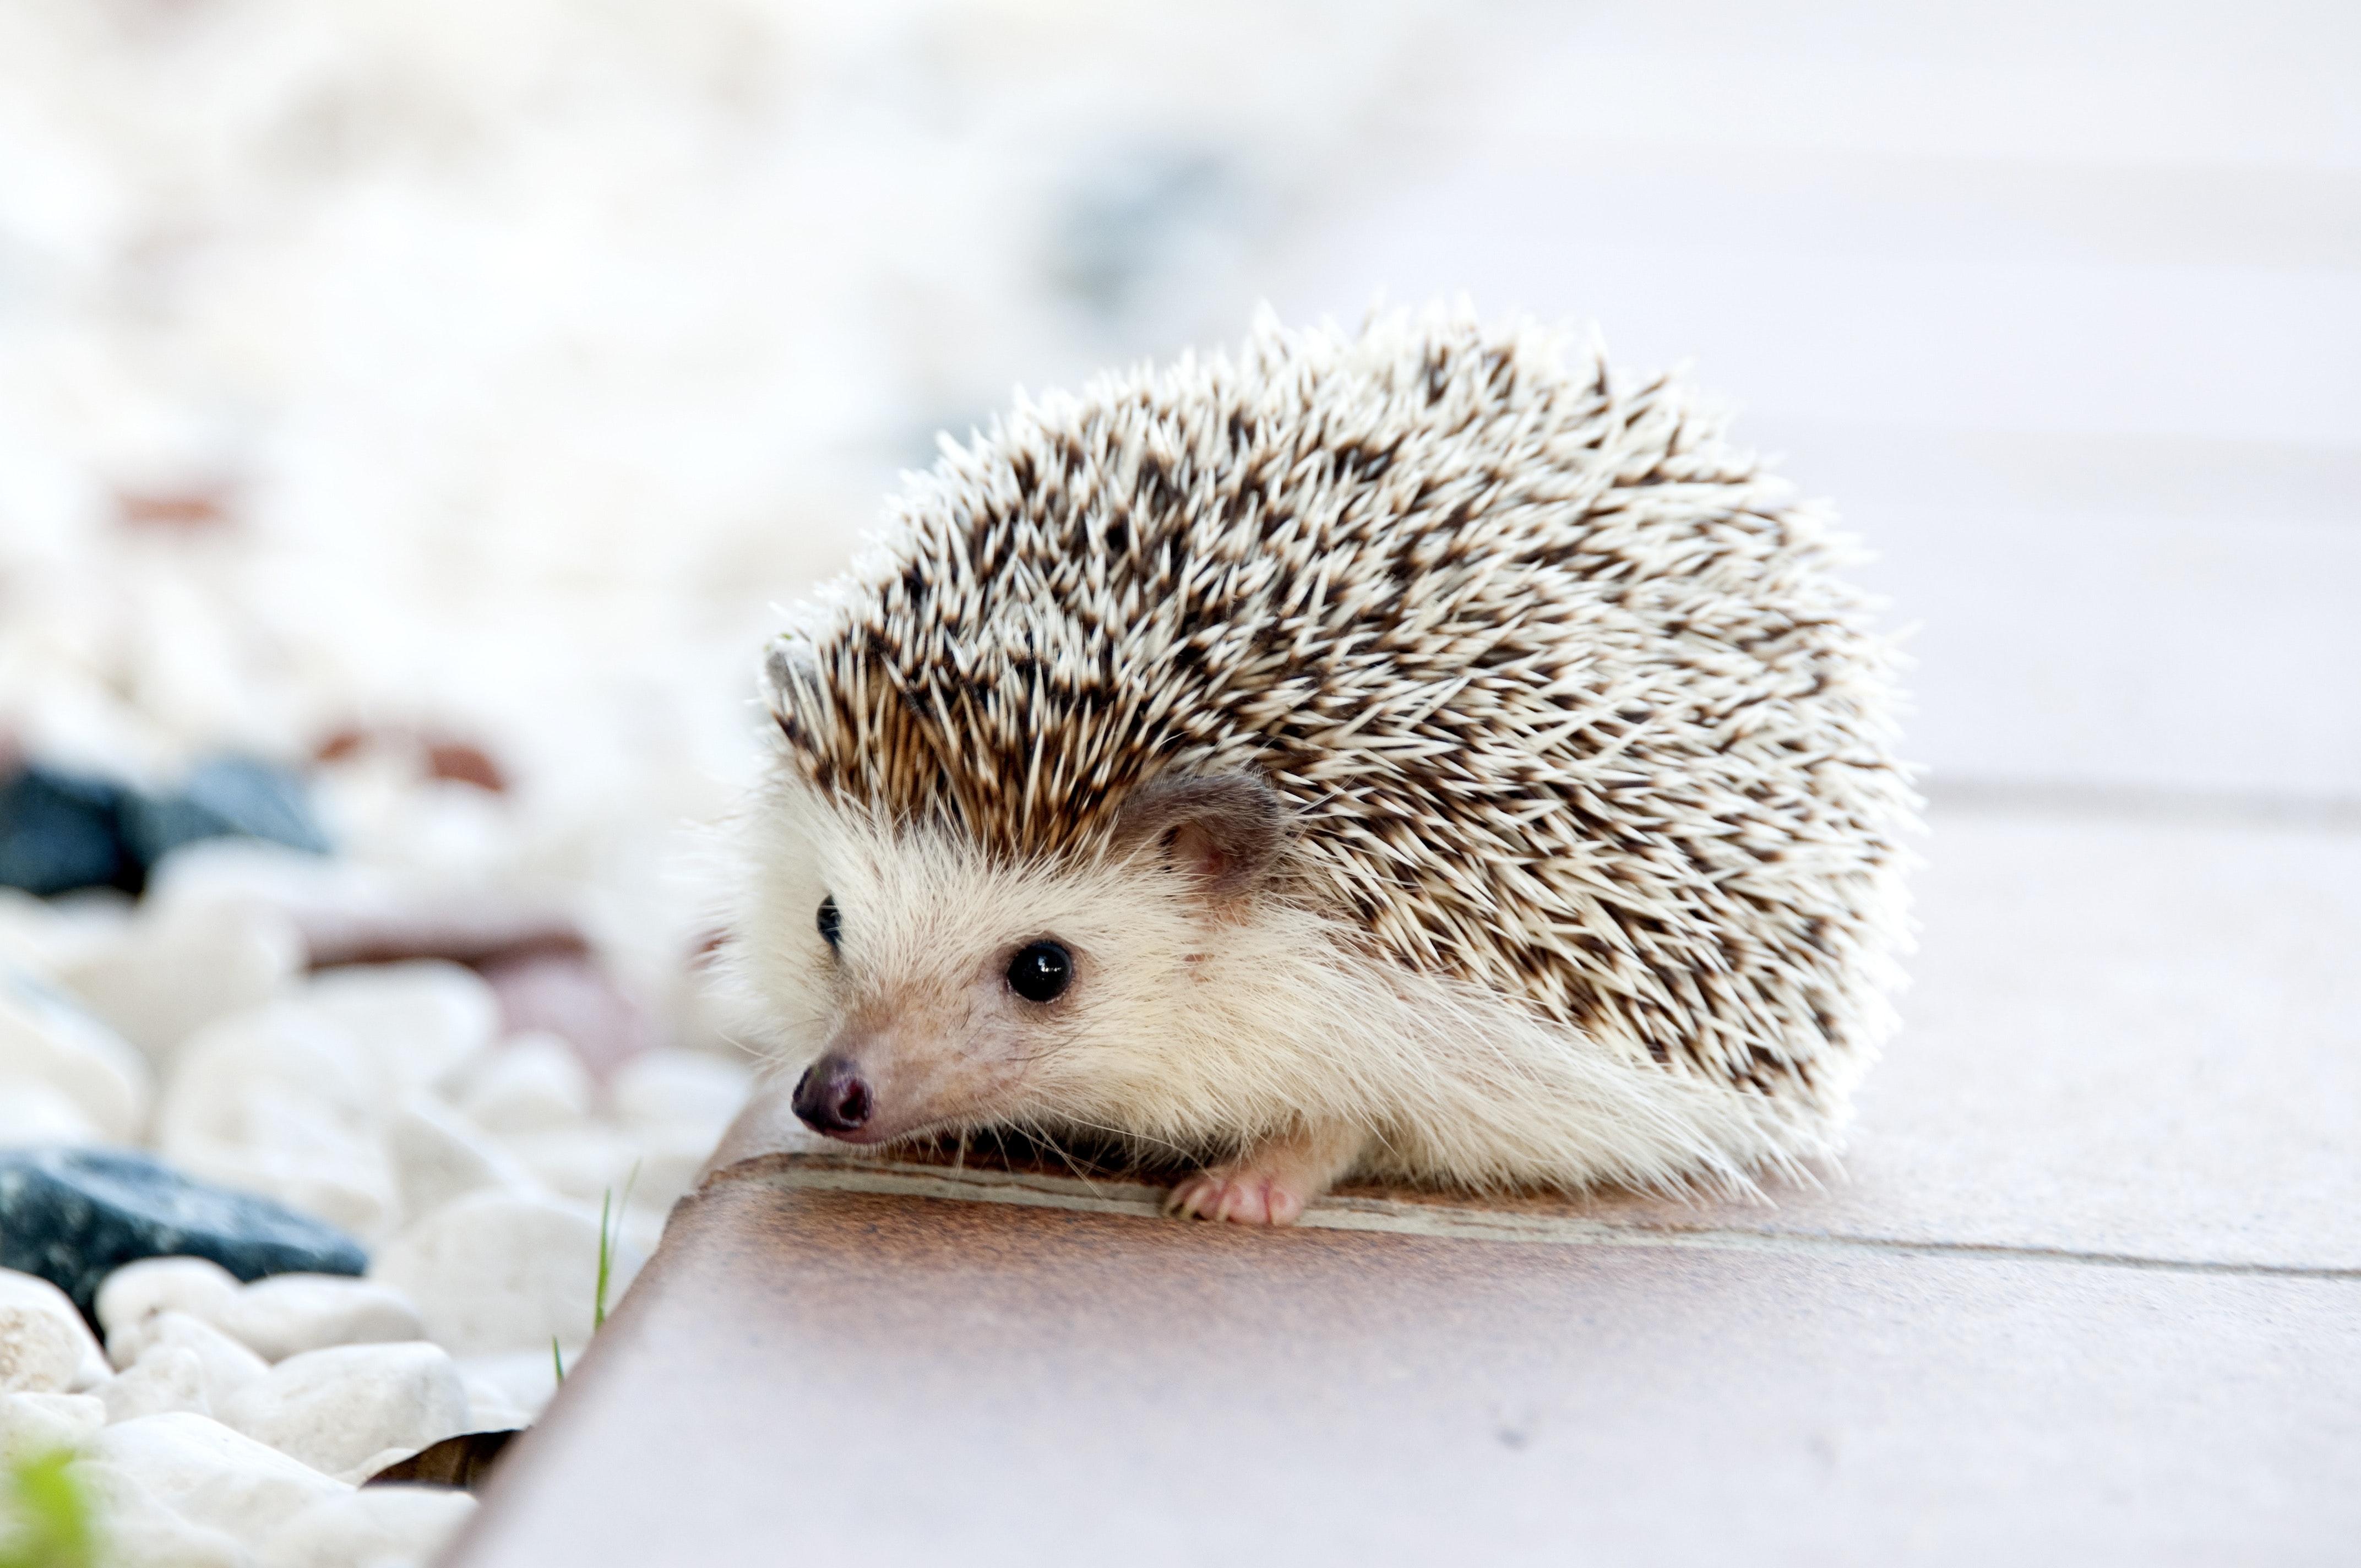 1000+ great cute animals photos · pexels · free stock photos